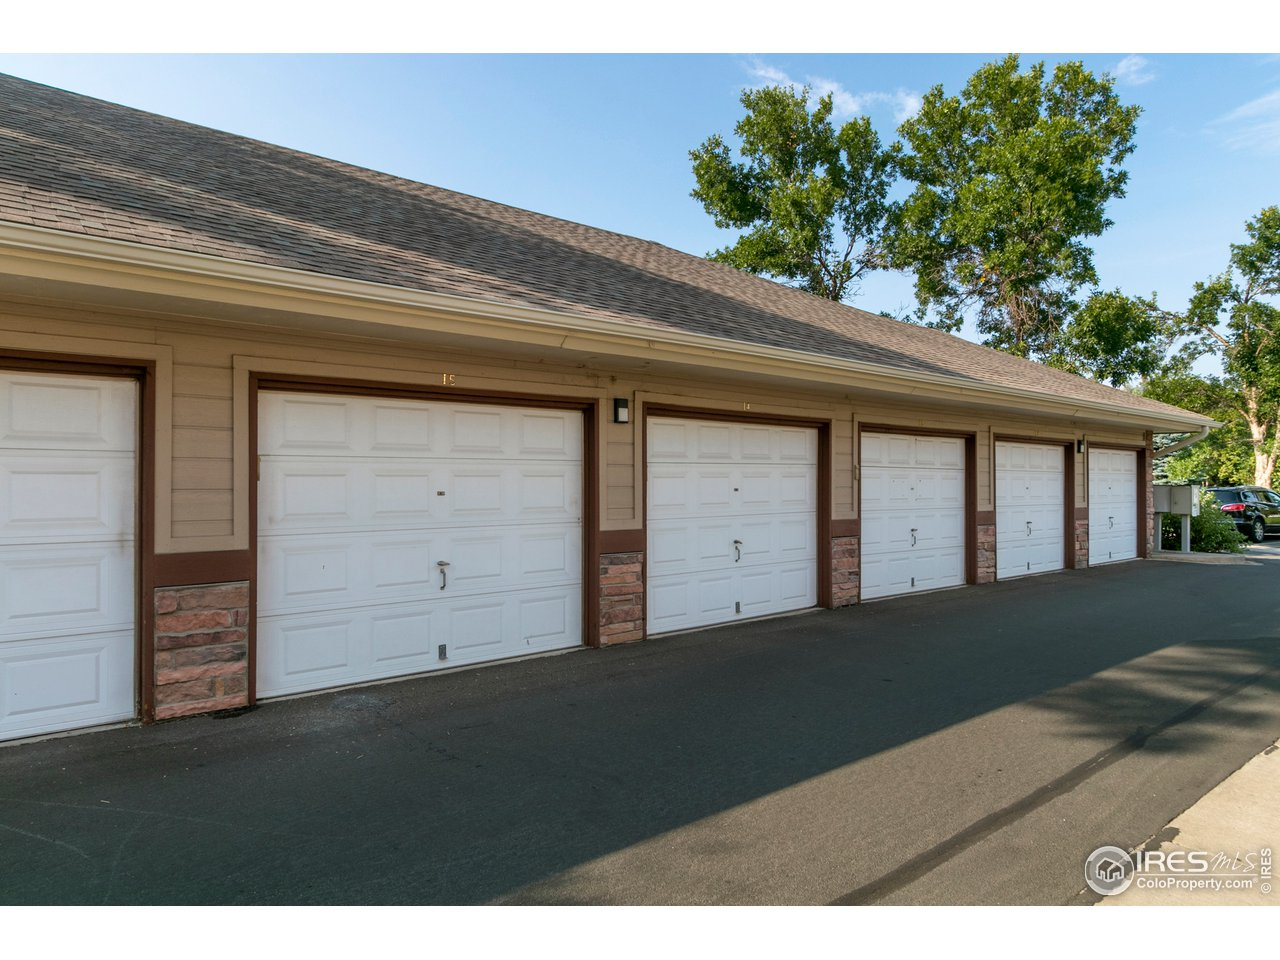 2 Detached Garages Included!